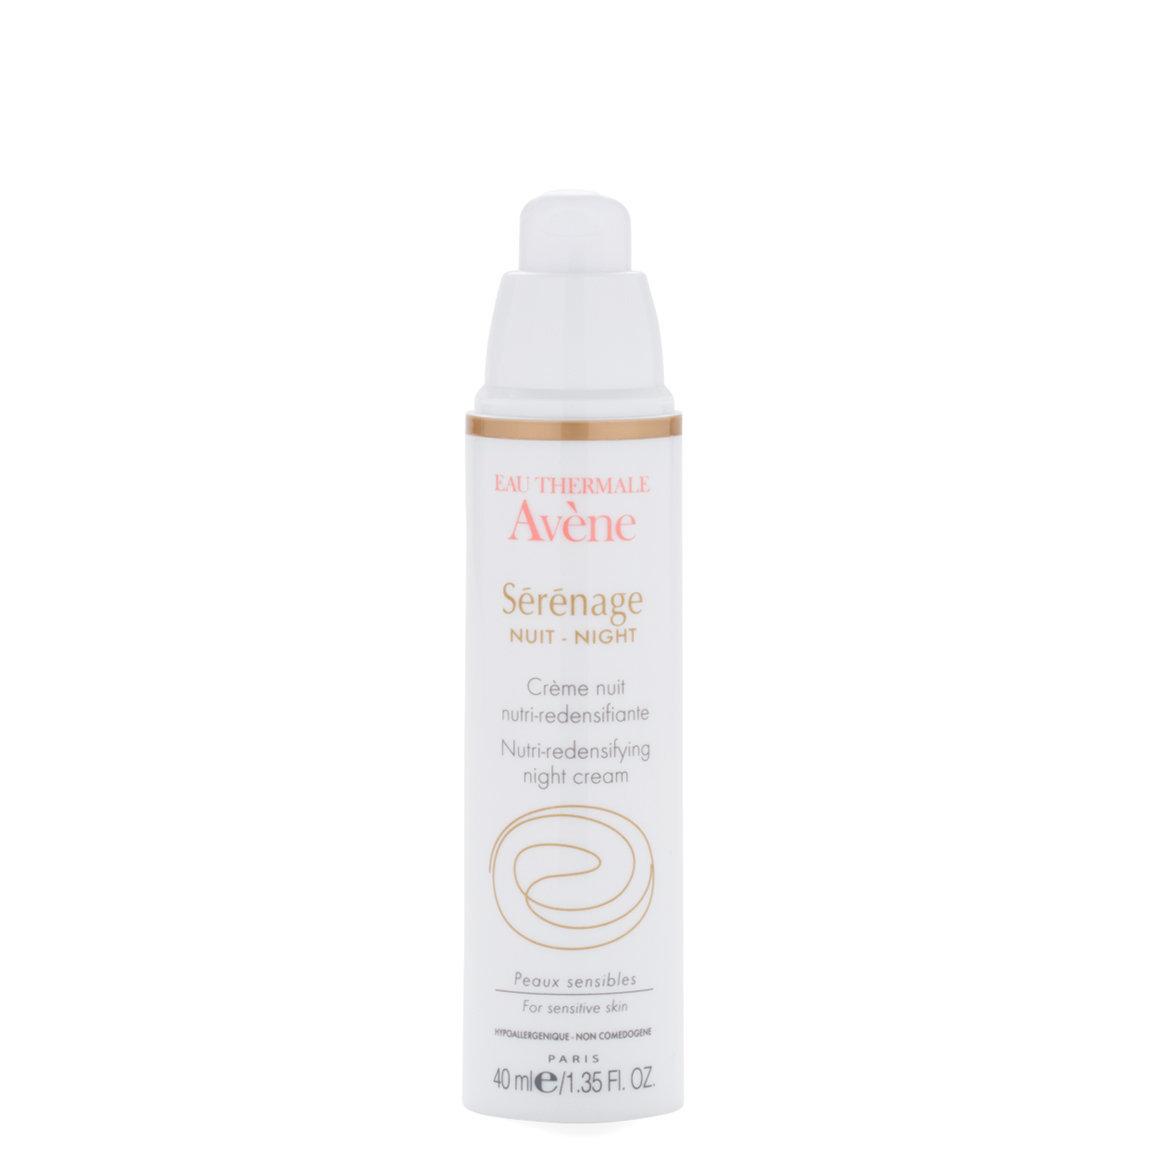 Eau Thermale Avène Serenage Nutri-Redensifying Night Cream